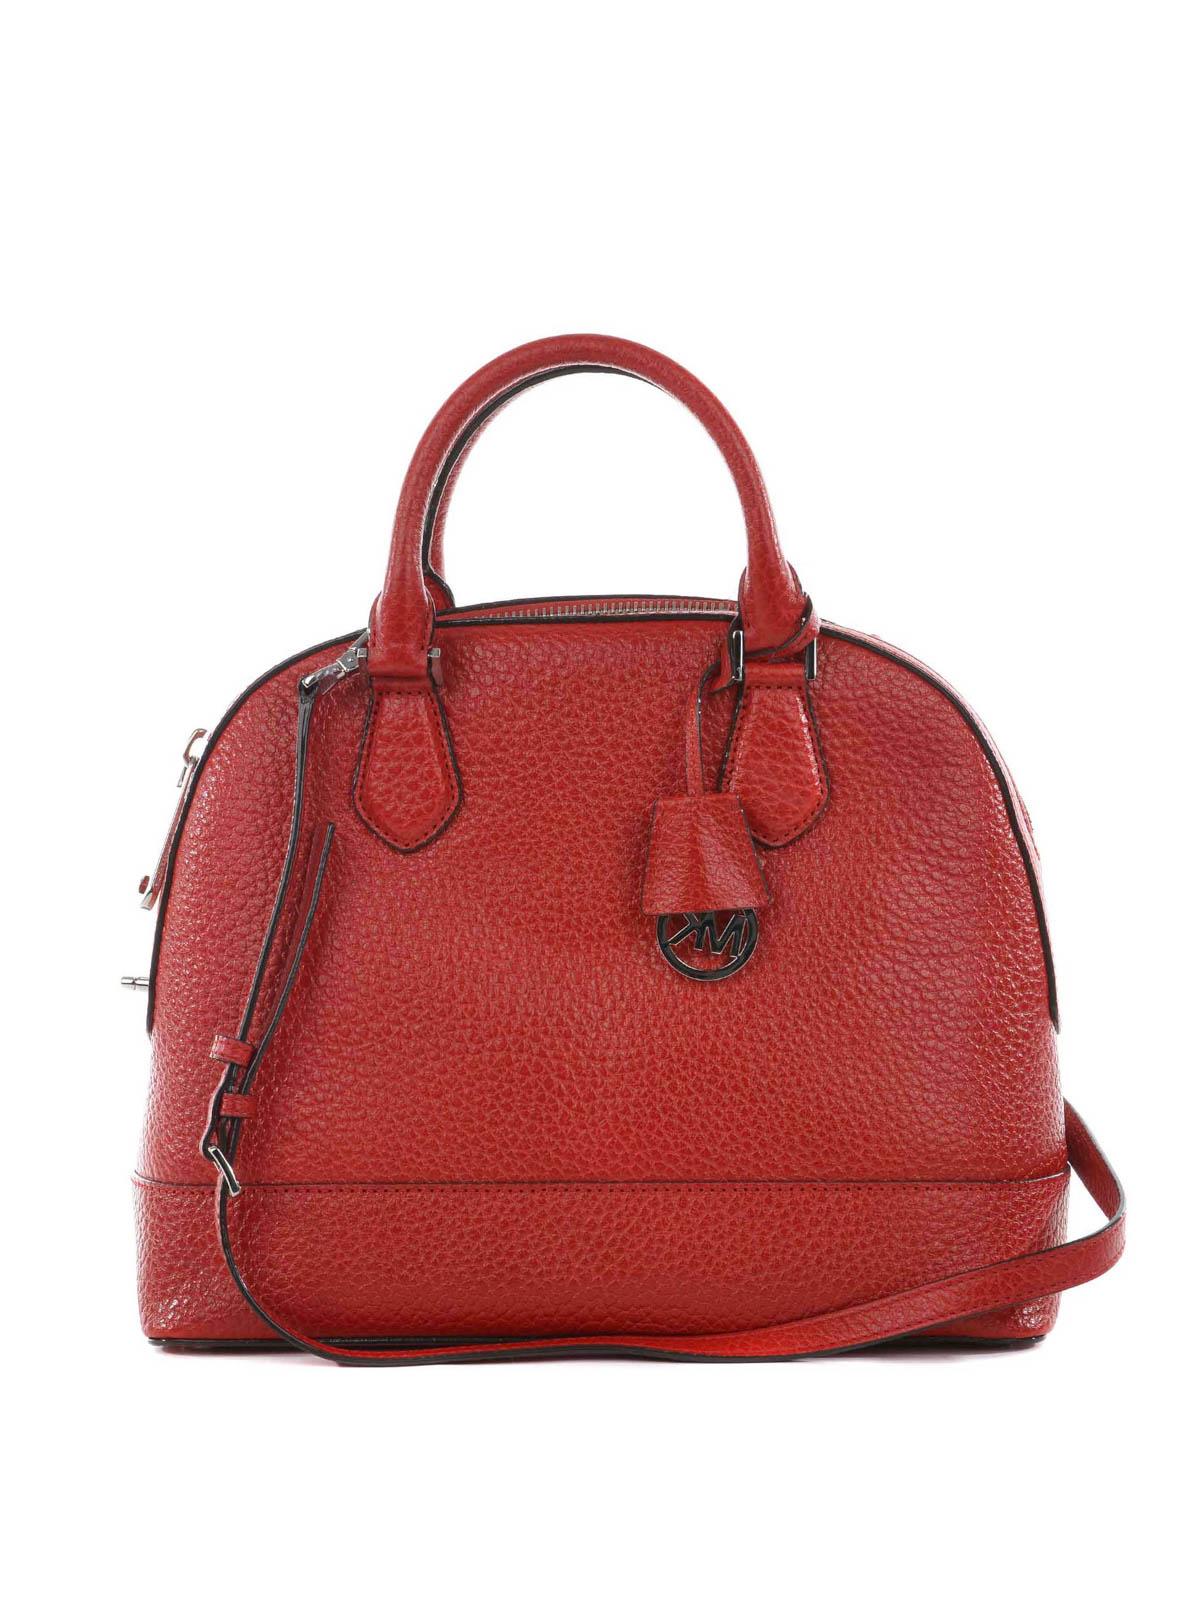 ed81b9875c82 Michael Kors - Smythe large leather handbag - totes bags ...